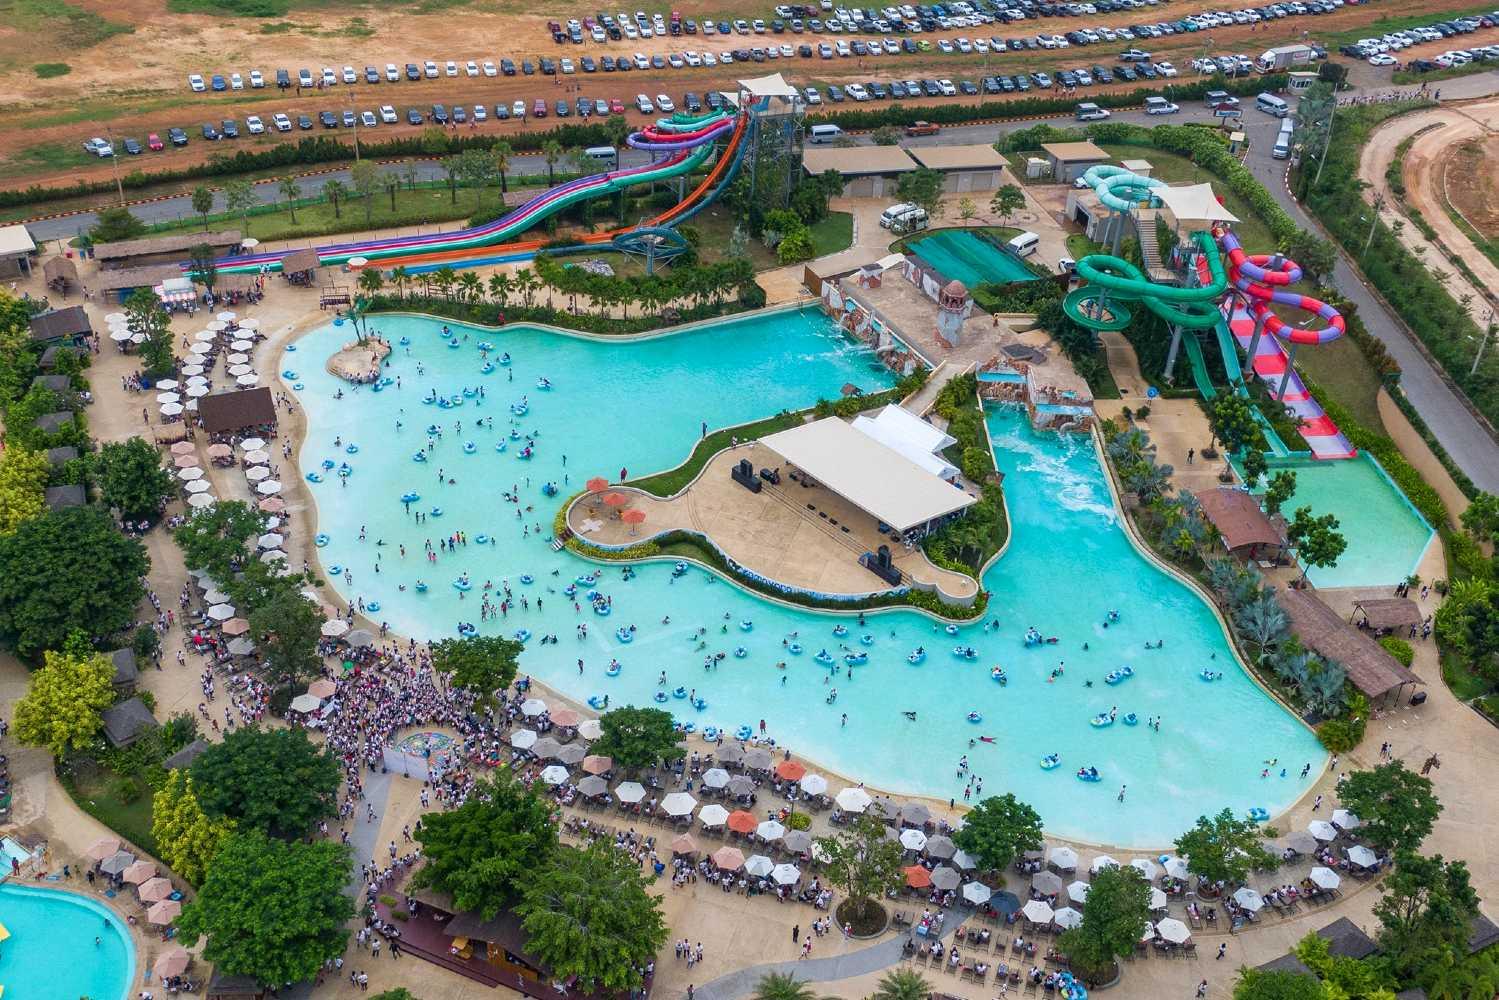 Large swimming pool with slides in Pattaya (Ramayana Water Park)